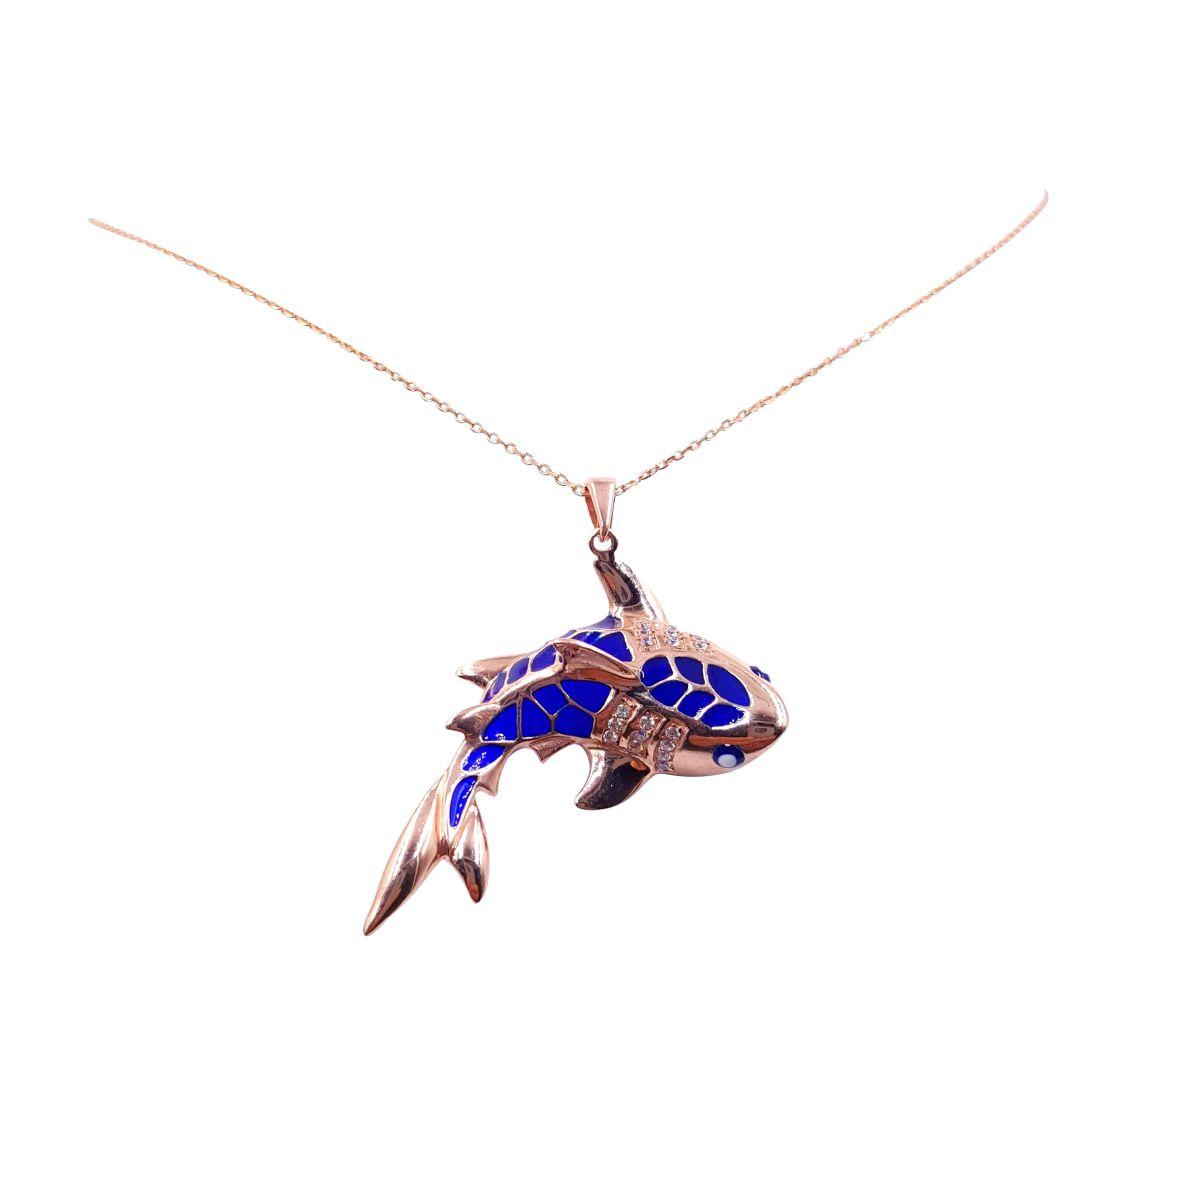 14k rose gold over sterling silver evil eye shark necklace 14k rose gold over sterling silver evil eye shark necklace aloadofball Images